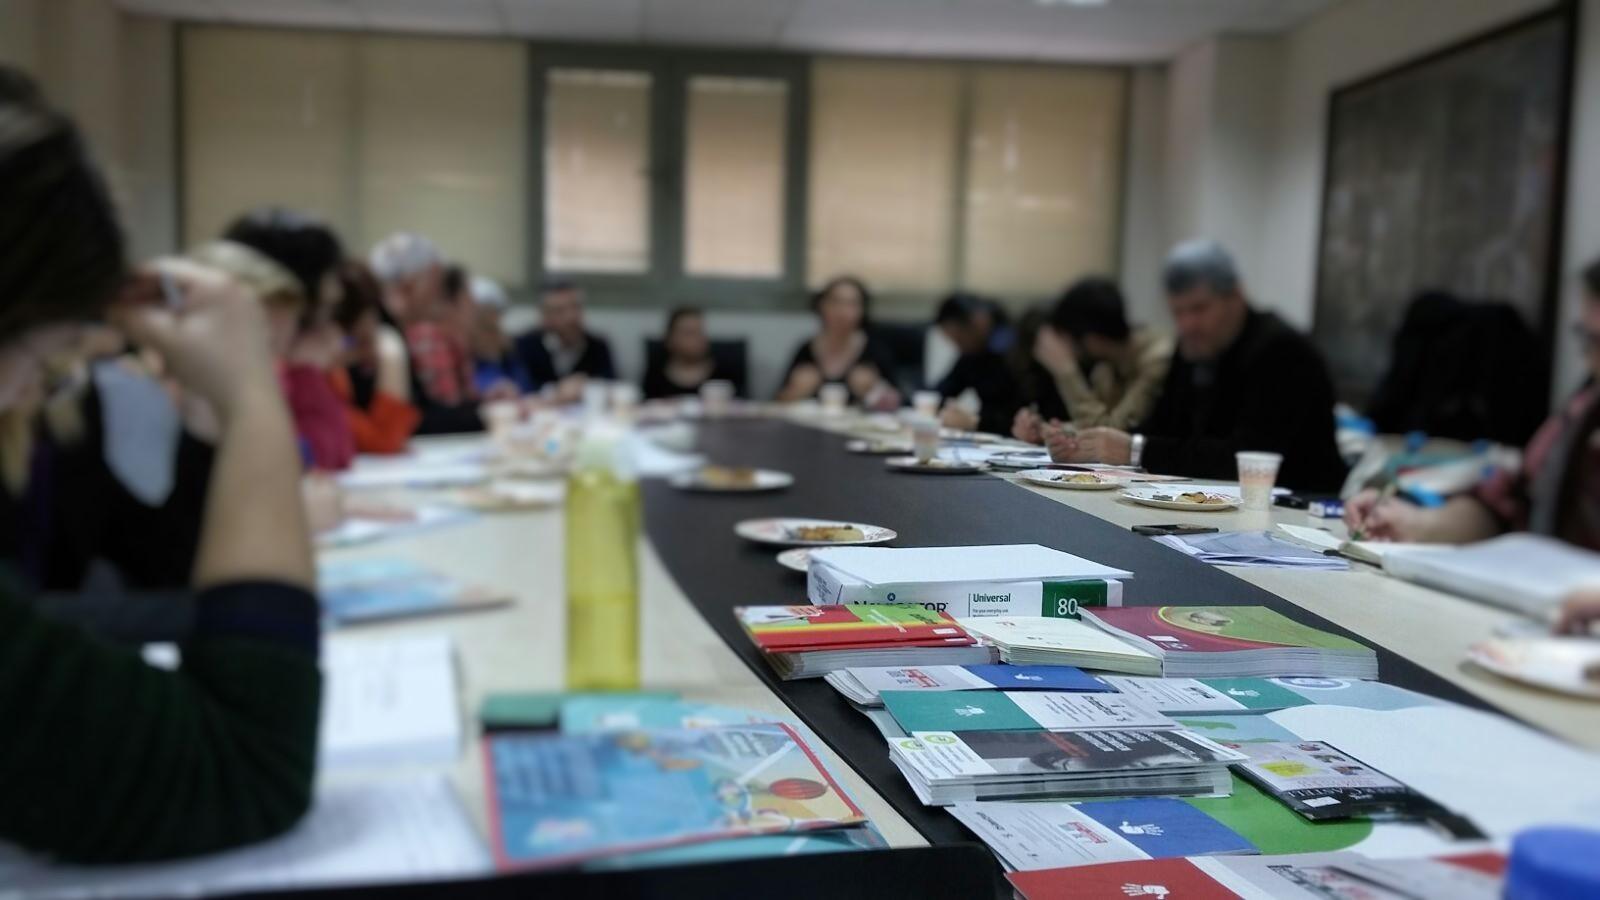 Ege Bölgesi 1inci Bölgesel Çalıştay Raporu